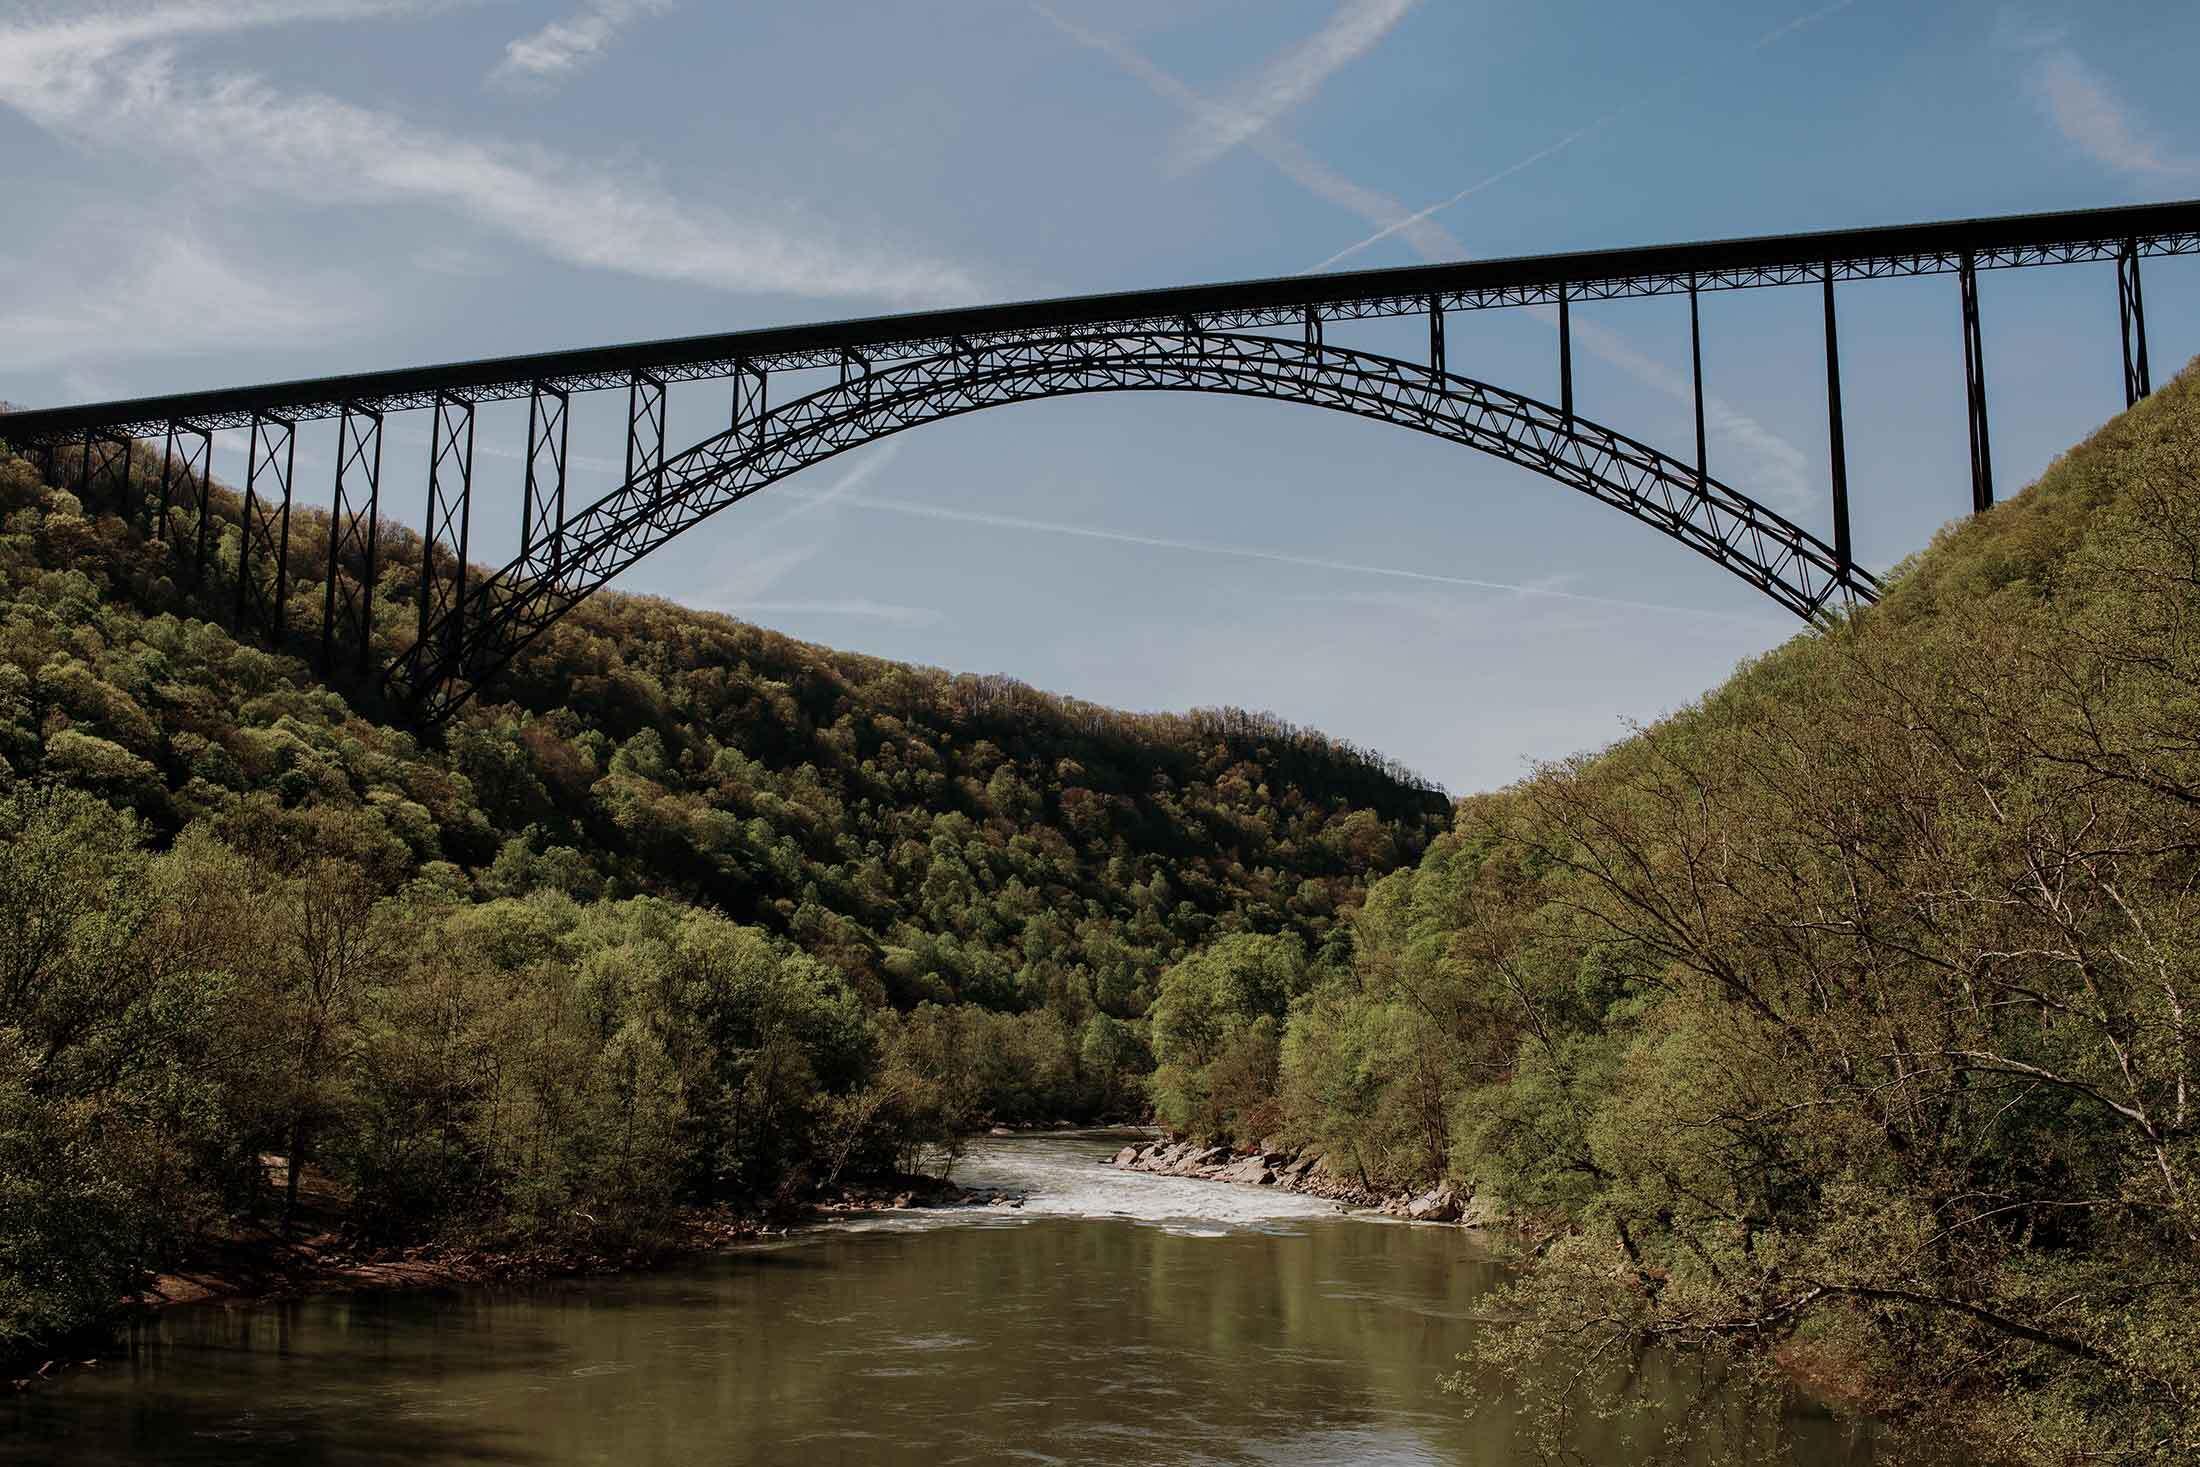 relates to Biden's Road to Clean Energy Runs Through West Virginia Coal Country